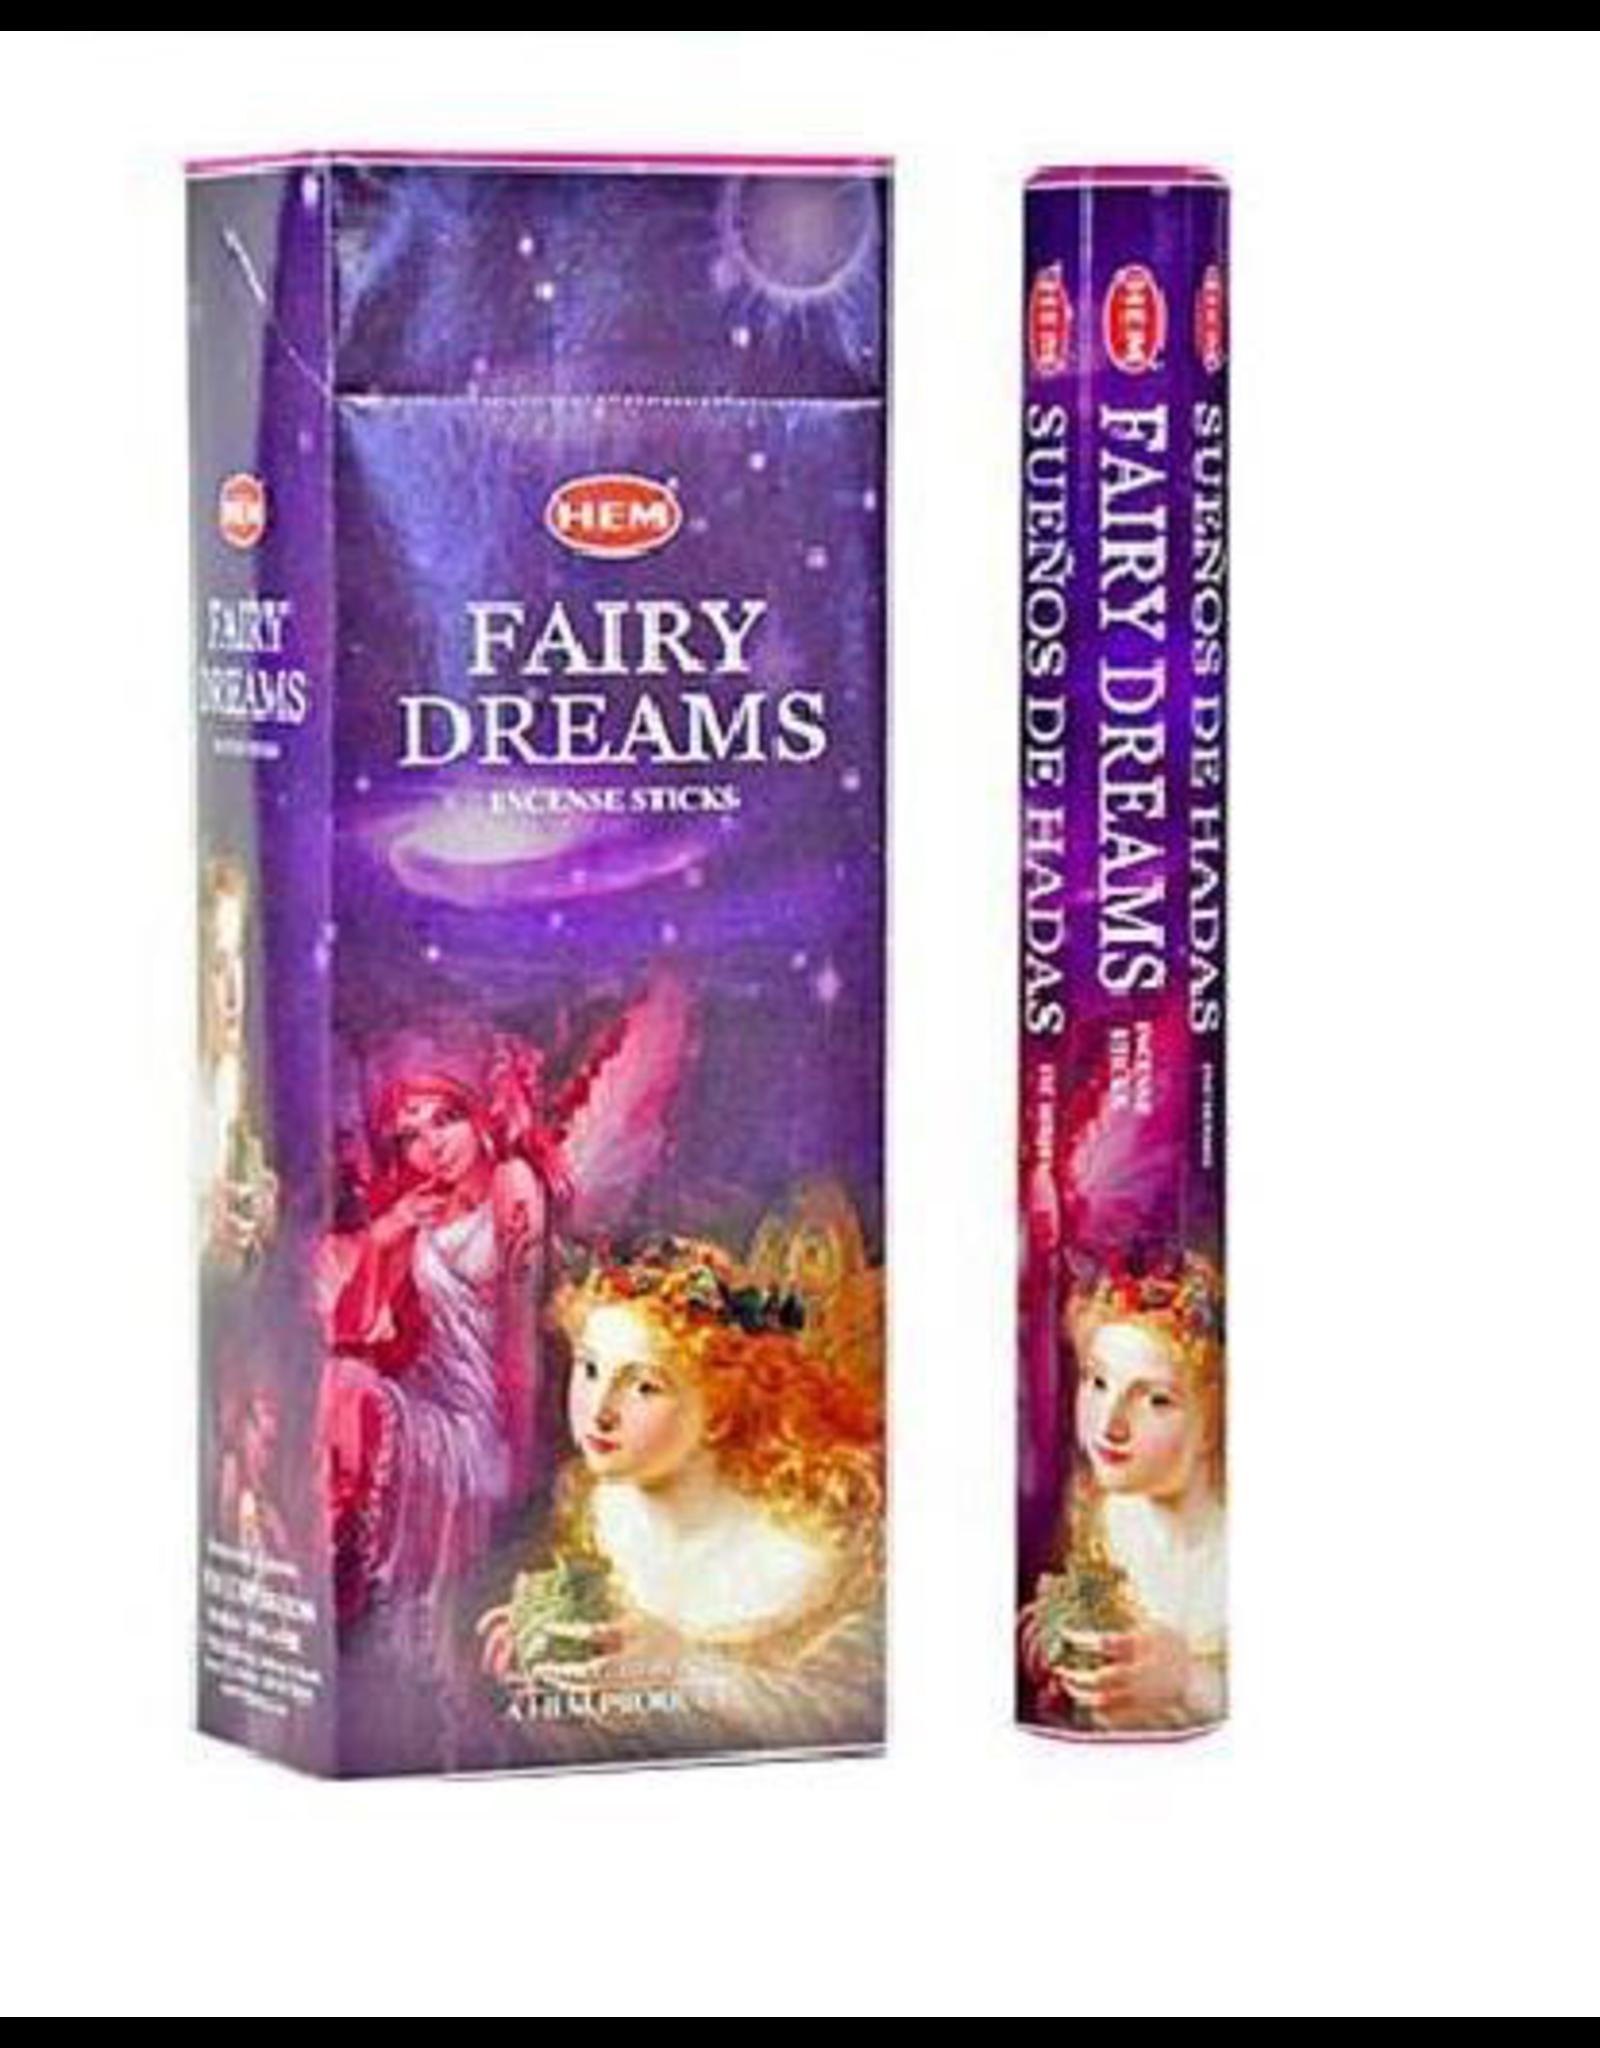 HEM 20 Gram Fairy Dreams Hex Box Incense